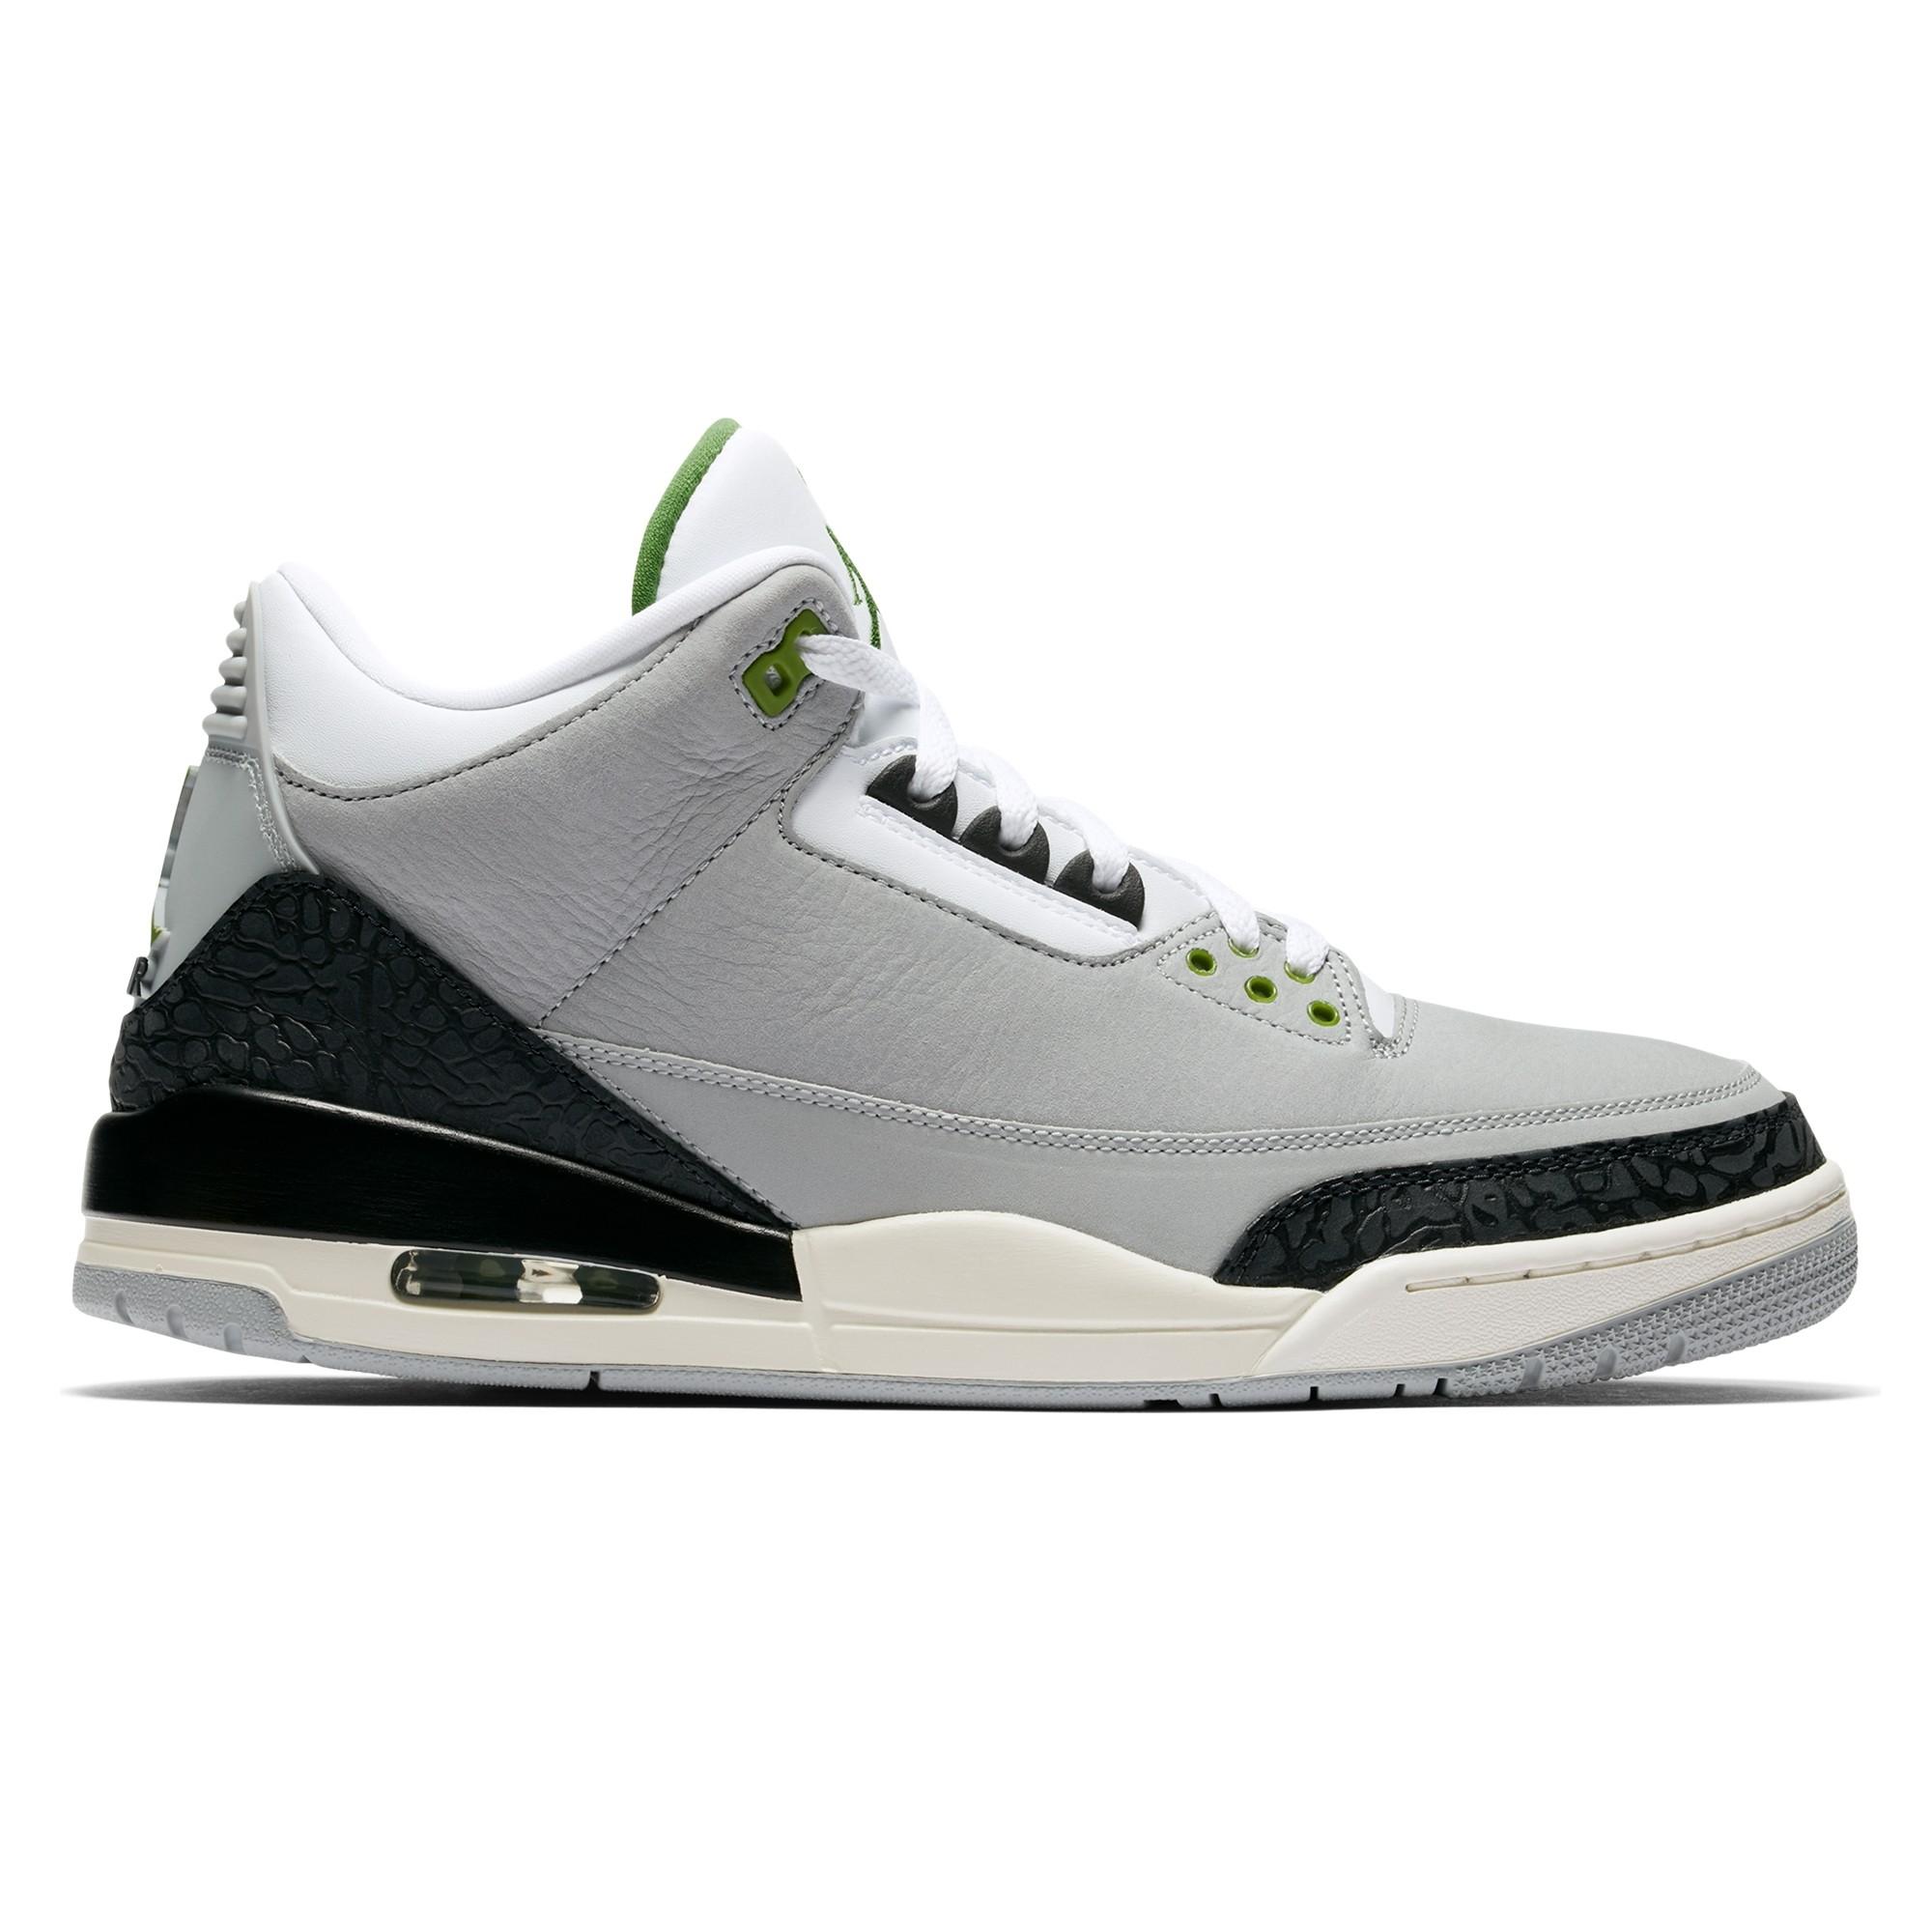 e7cedb2cddcbb7 Jordan Brand Nike Air Jordan 3 Retro  Chlorophyll Tinker  (LT Smoke ...